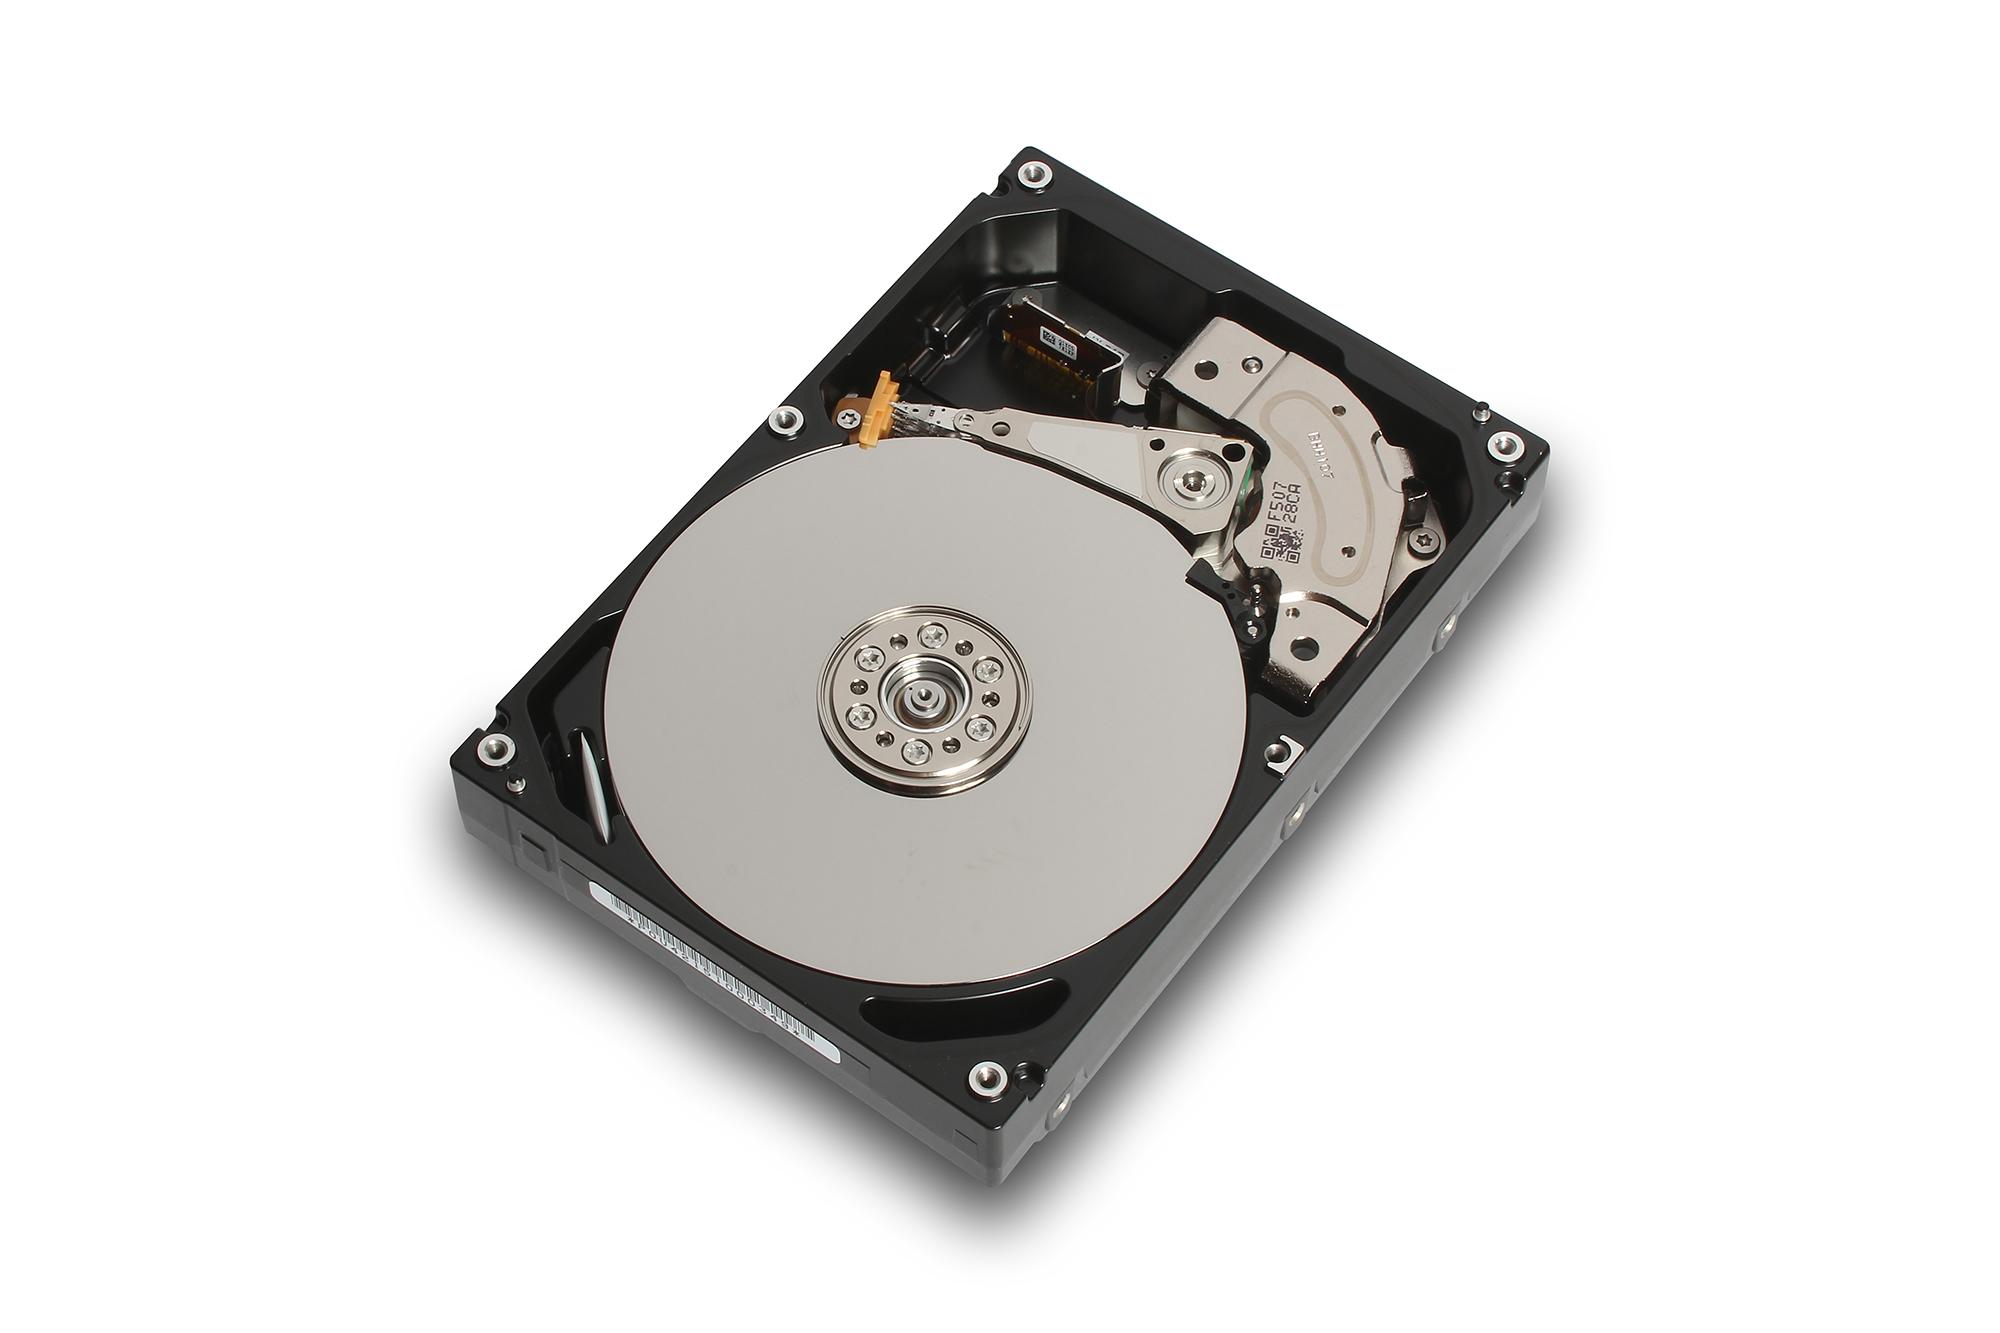 TOSHIBA強勢宣布硬碟容量將創新高! 史上最高效能8TB  MG系列企業級硬碟正式登場!